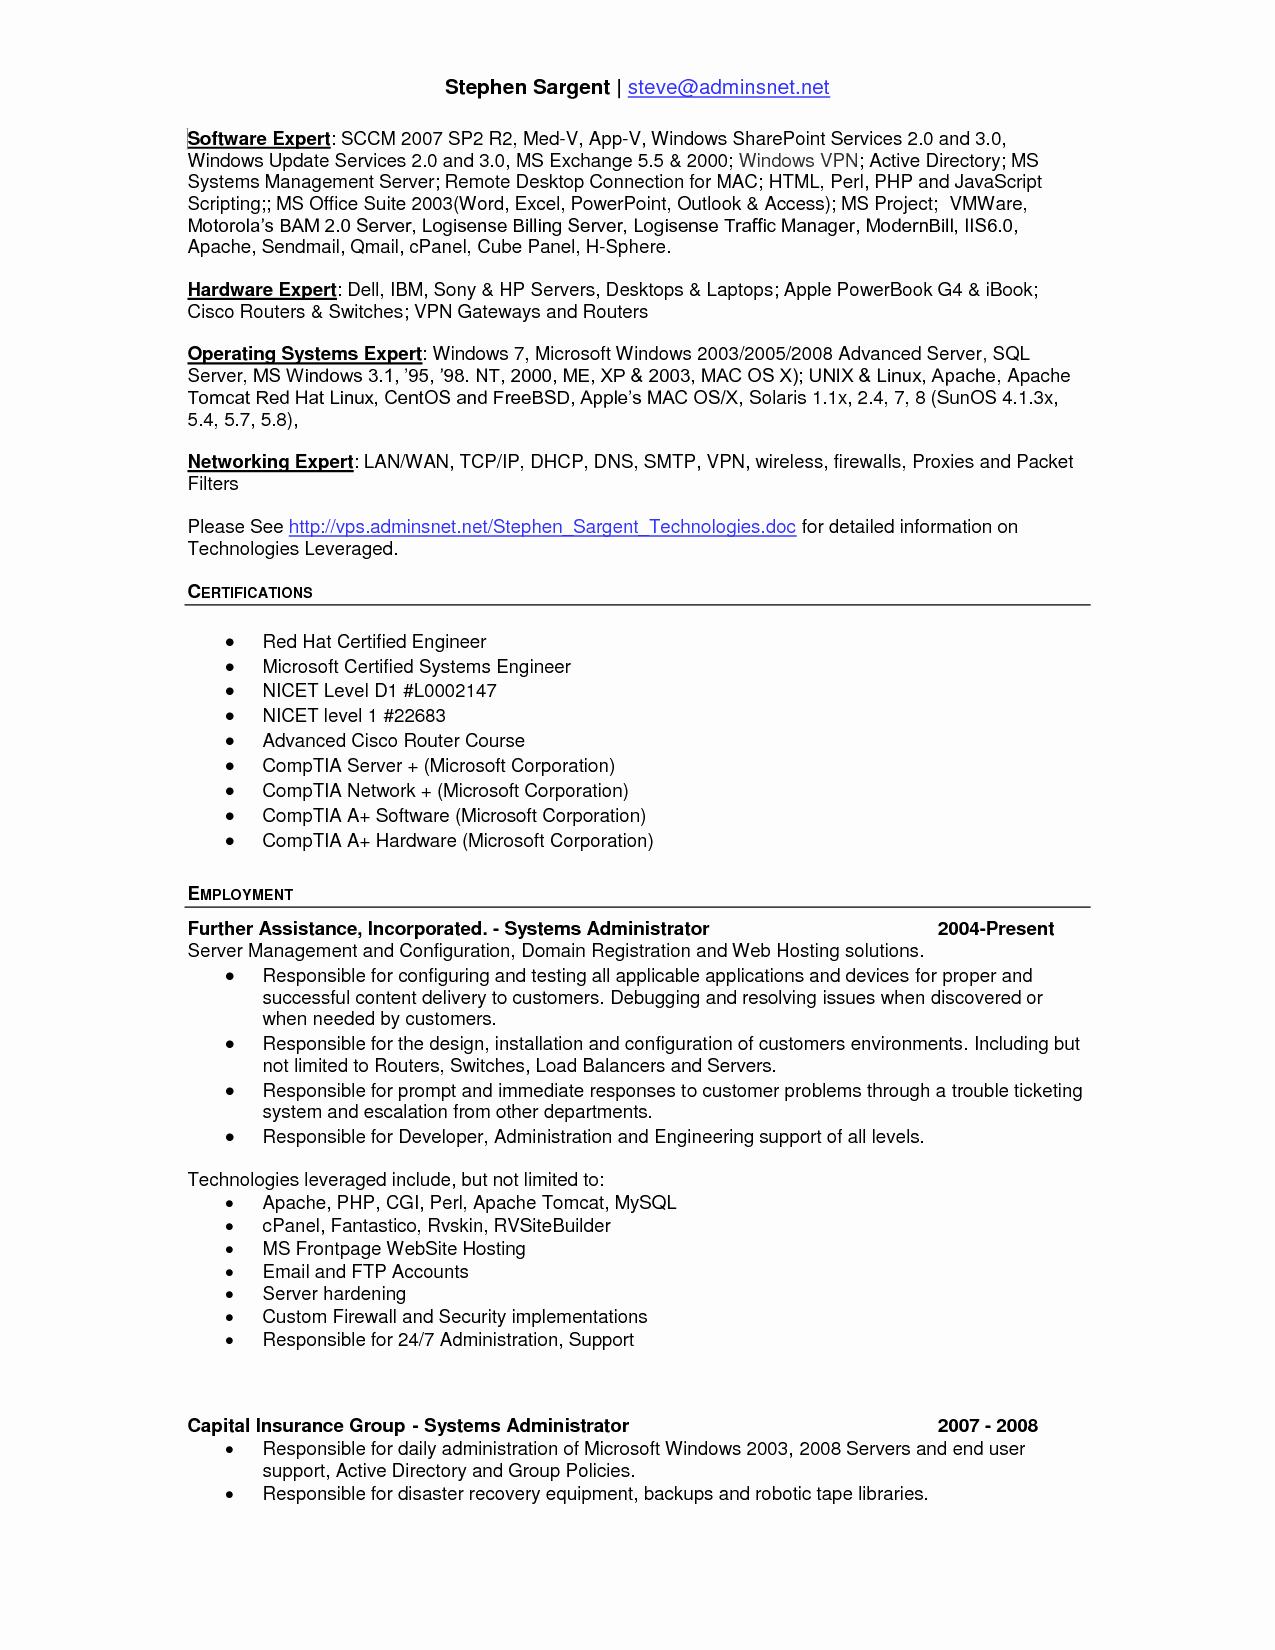 Resume Templates for Mac Elegant Resume Template for Mac